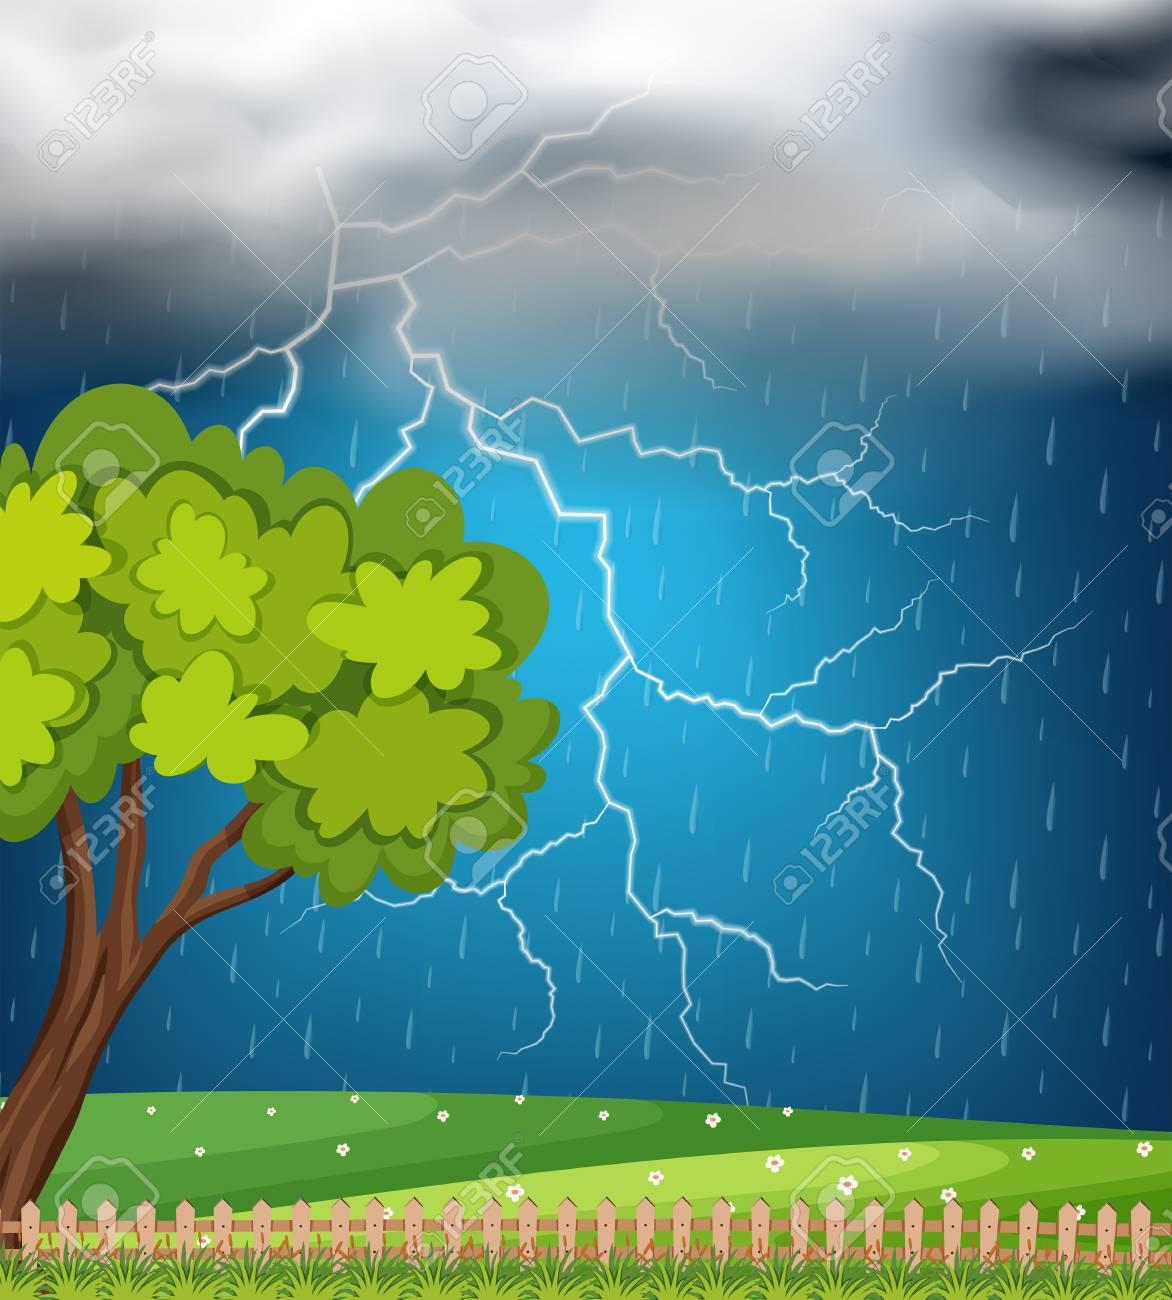 Background scene with thunder and rainstorm illustration - 93436761